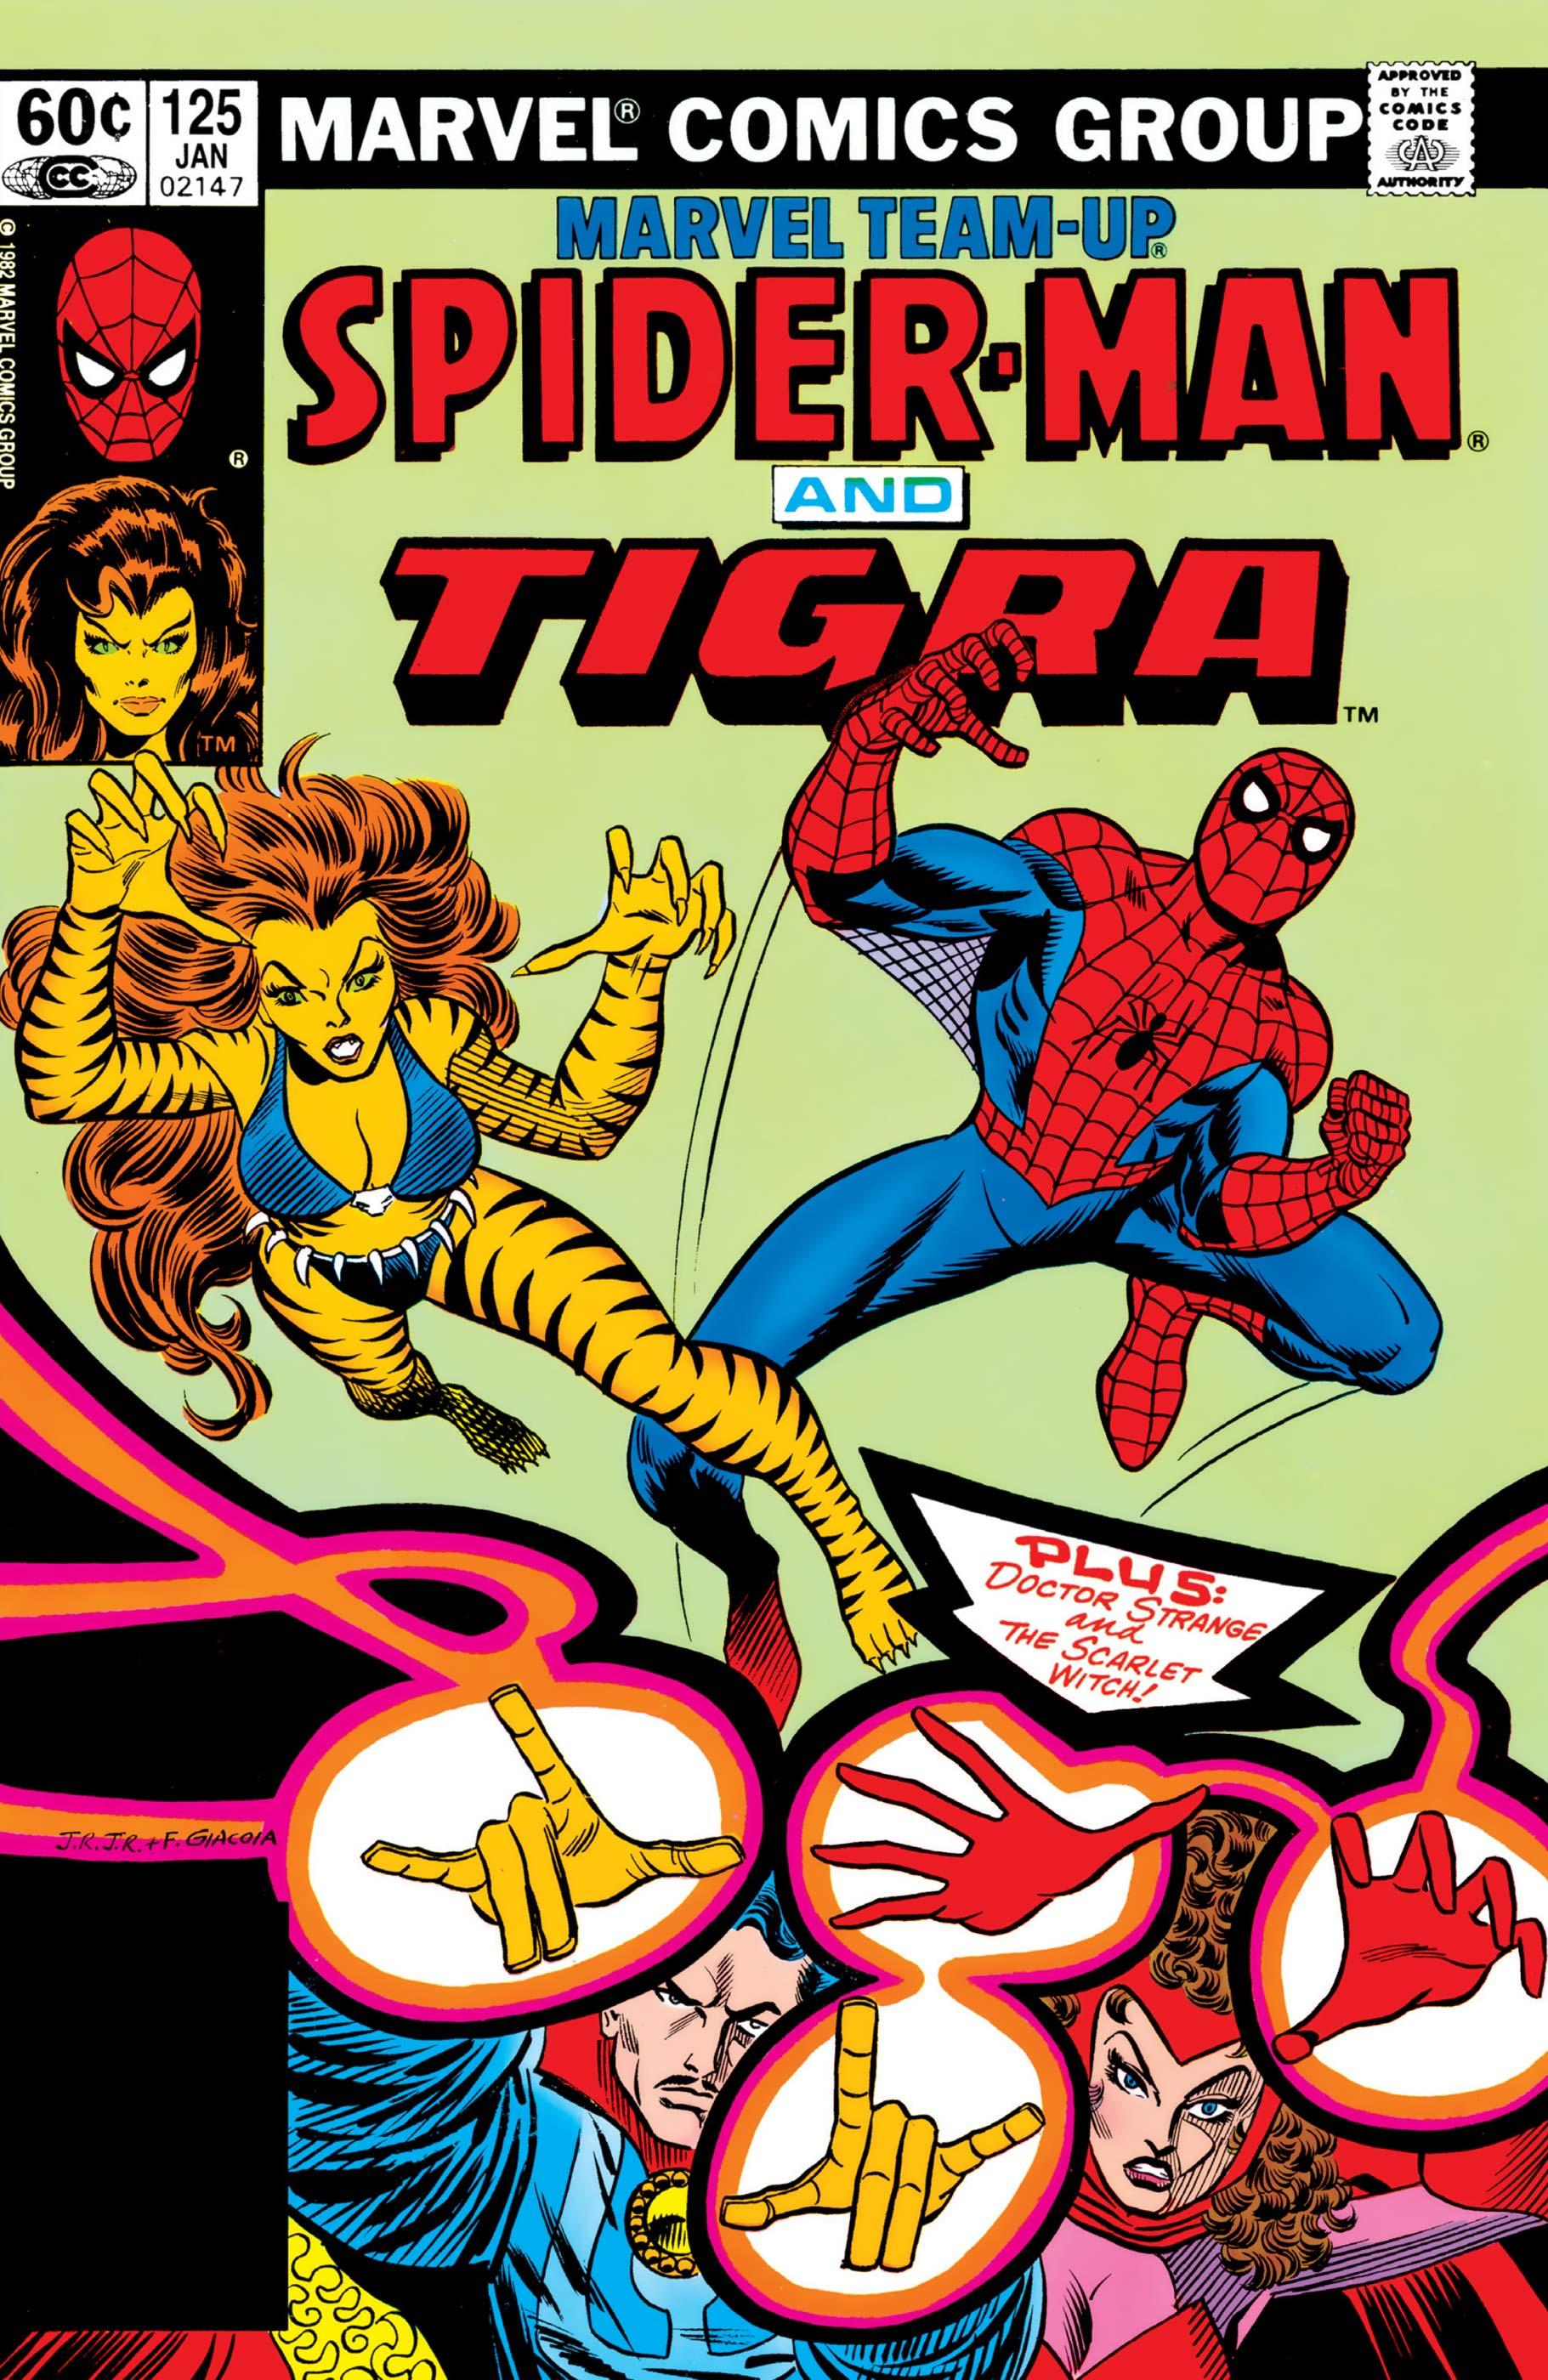 Marvel Team-Up (1972) #125